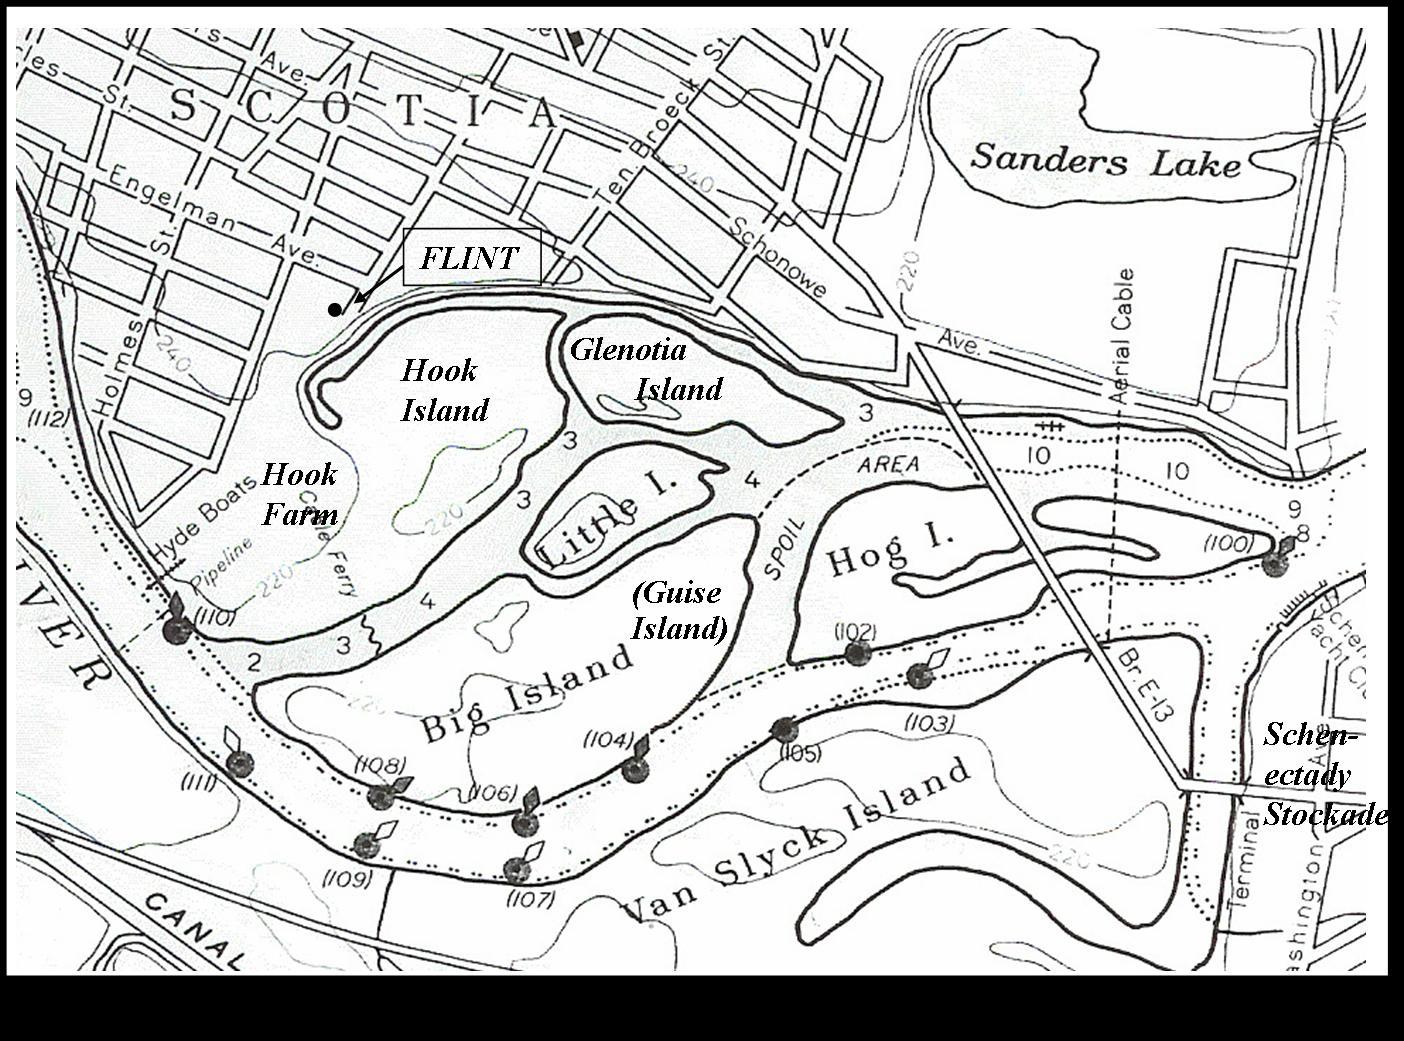 Flint House Archaeological Report